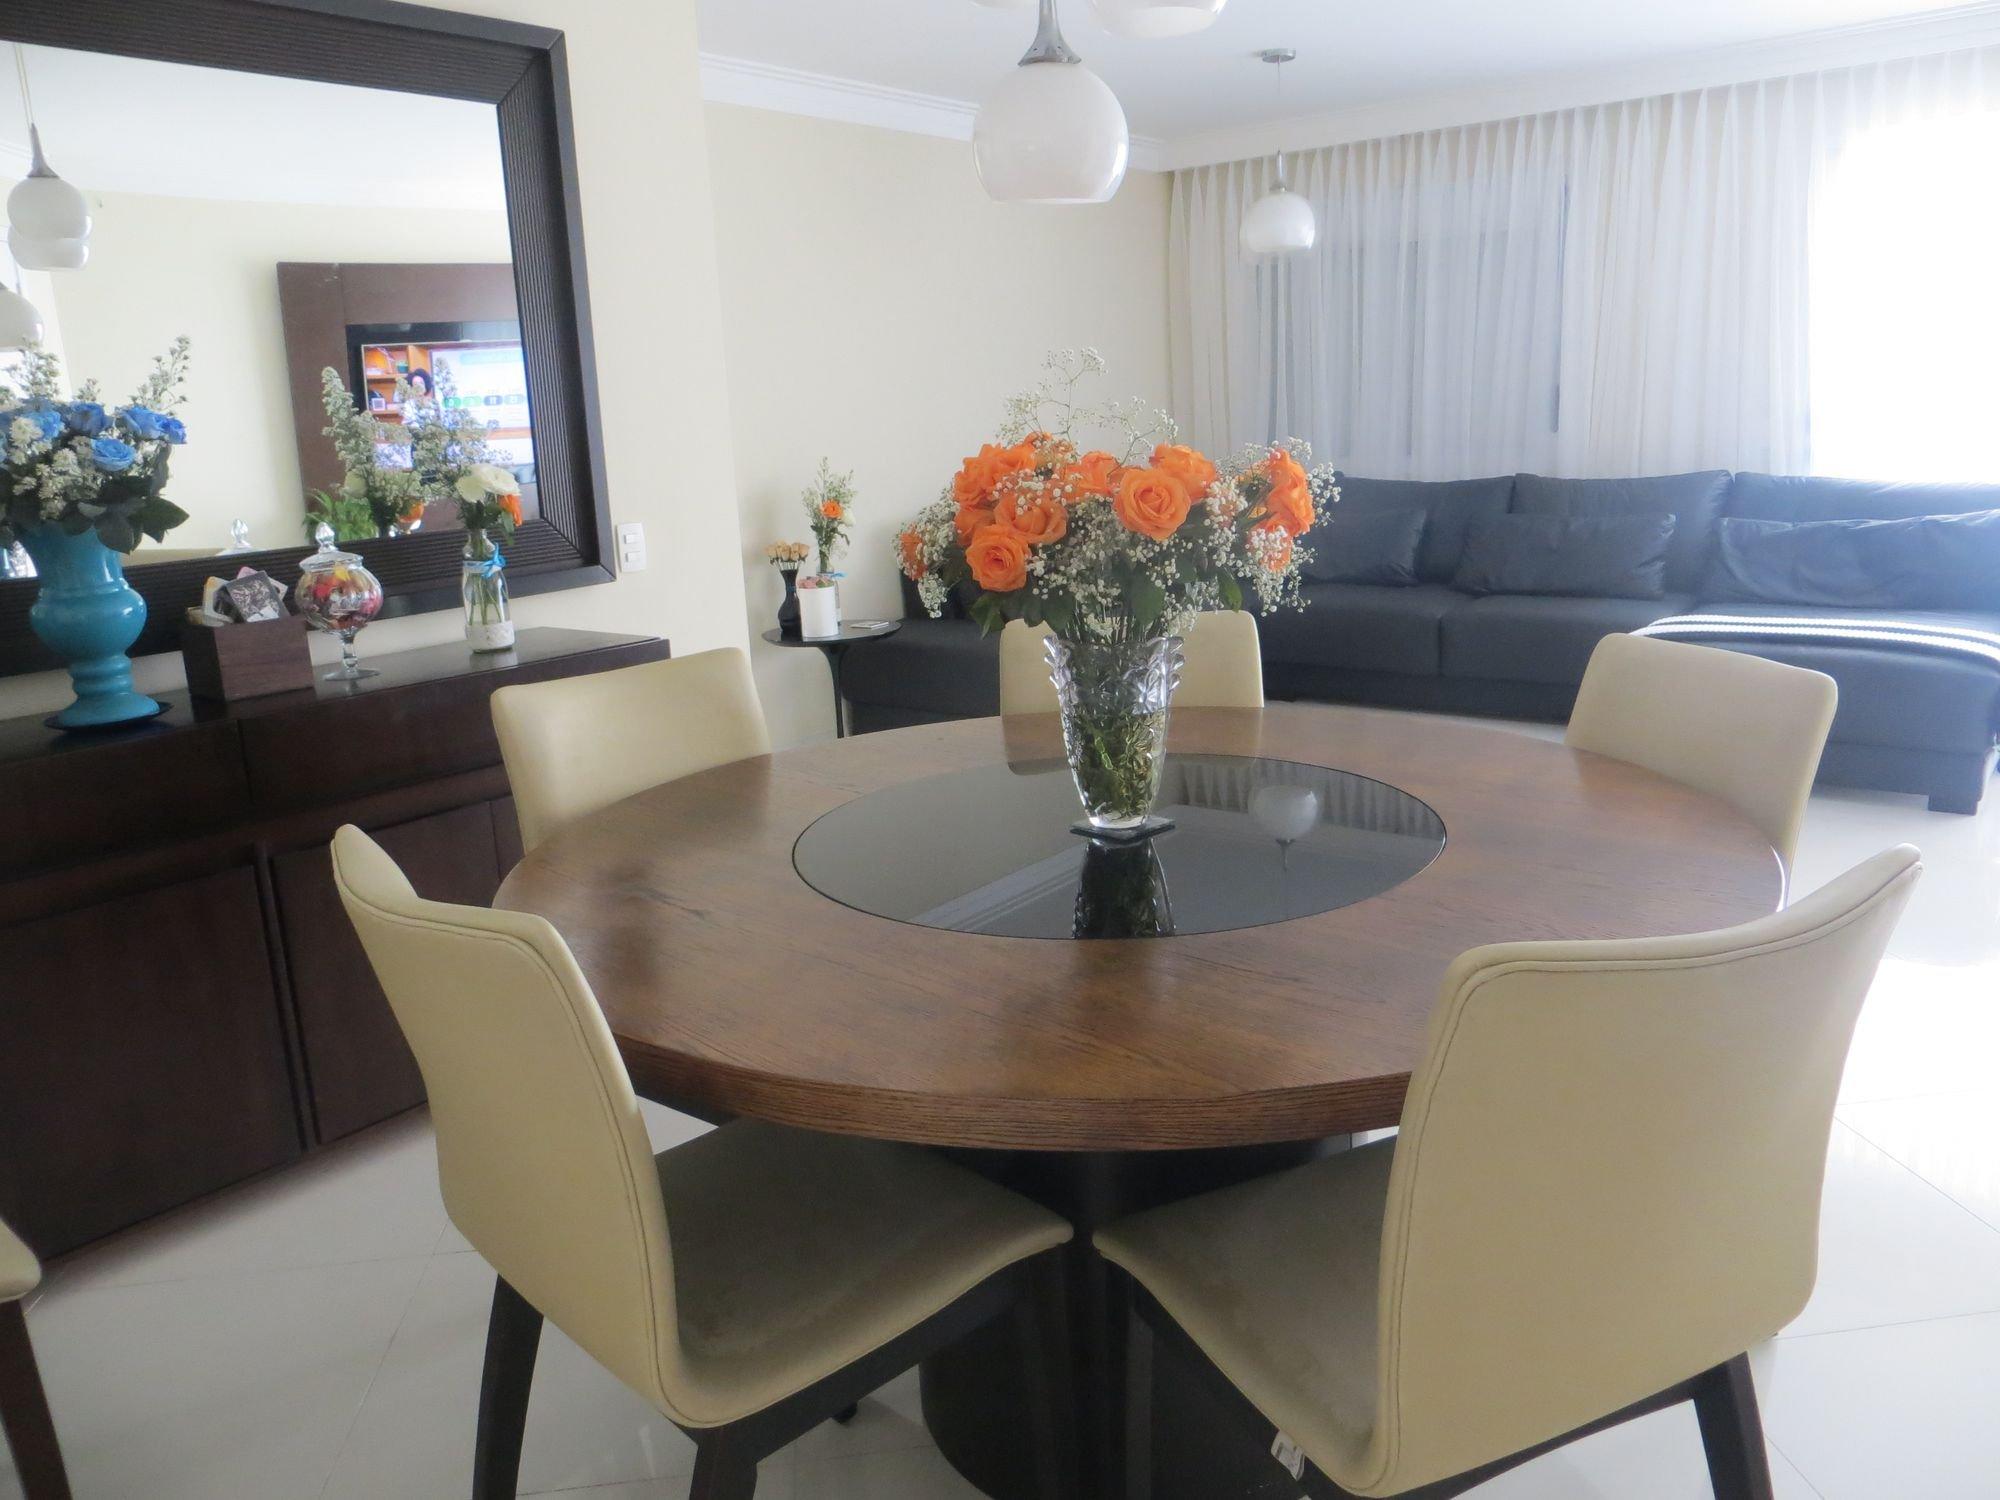 Foto de Hall com vaso de planta, sofá, vaso, cadeira, mesa de jantar